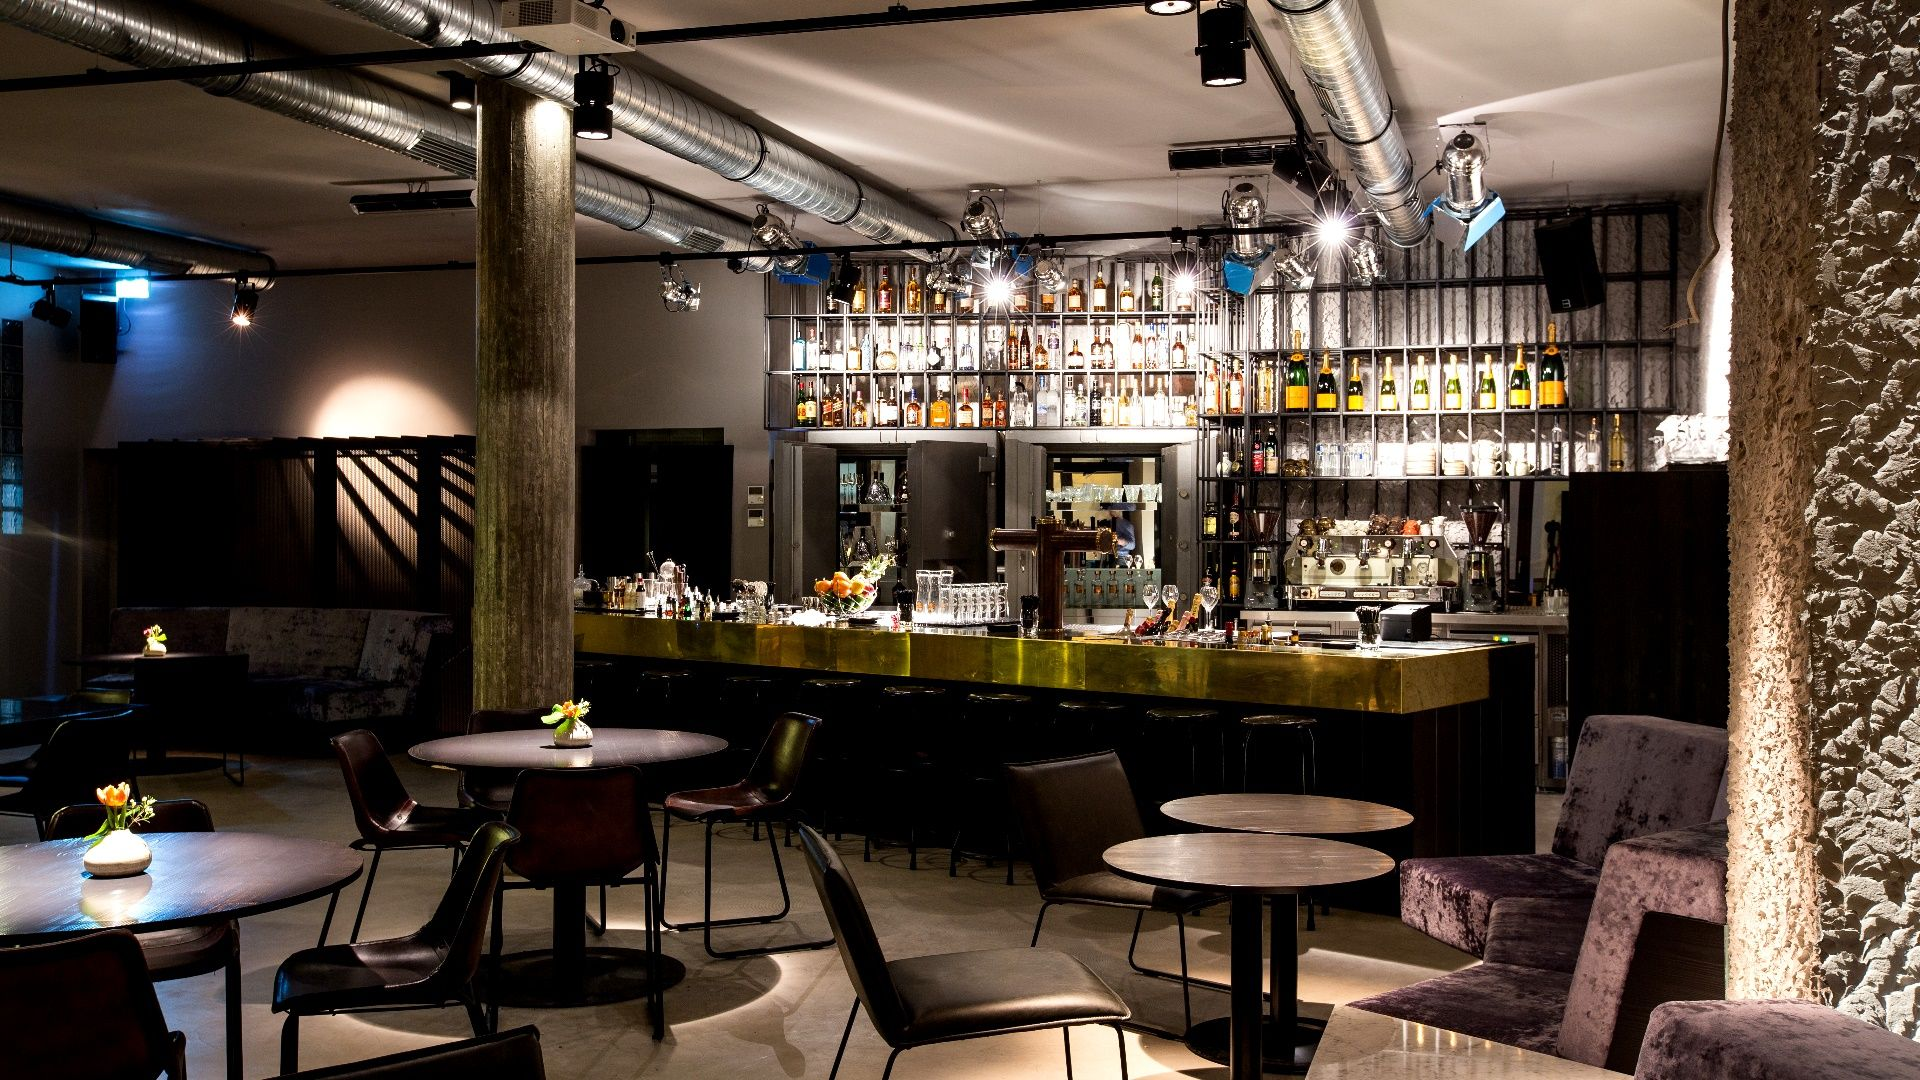 jesse james restaurant bar stylishes bar restaurant frankfurt main restaurant bar. Black Bedroom Furniture Sets. Home Design Ideas